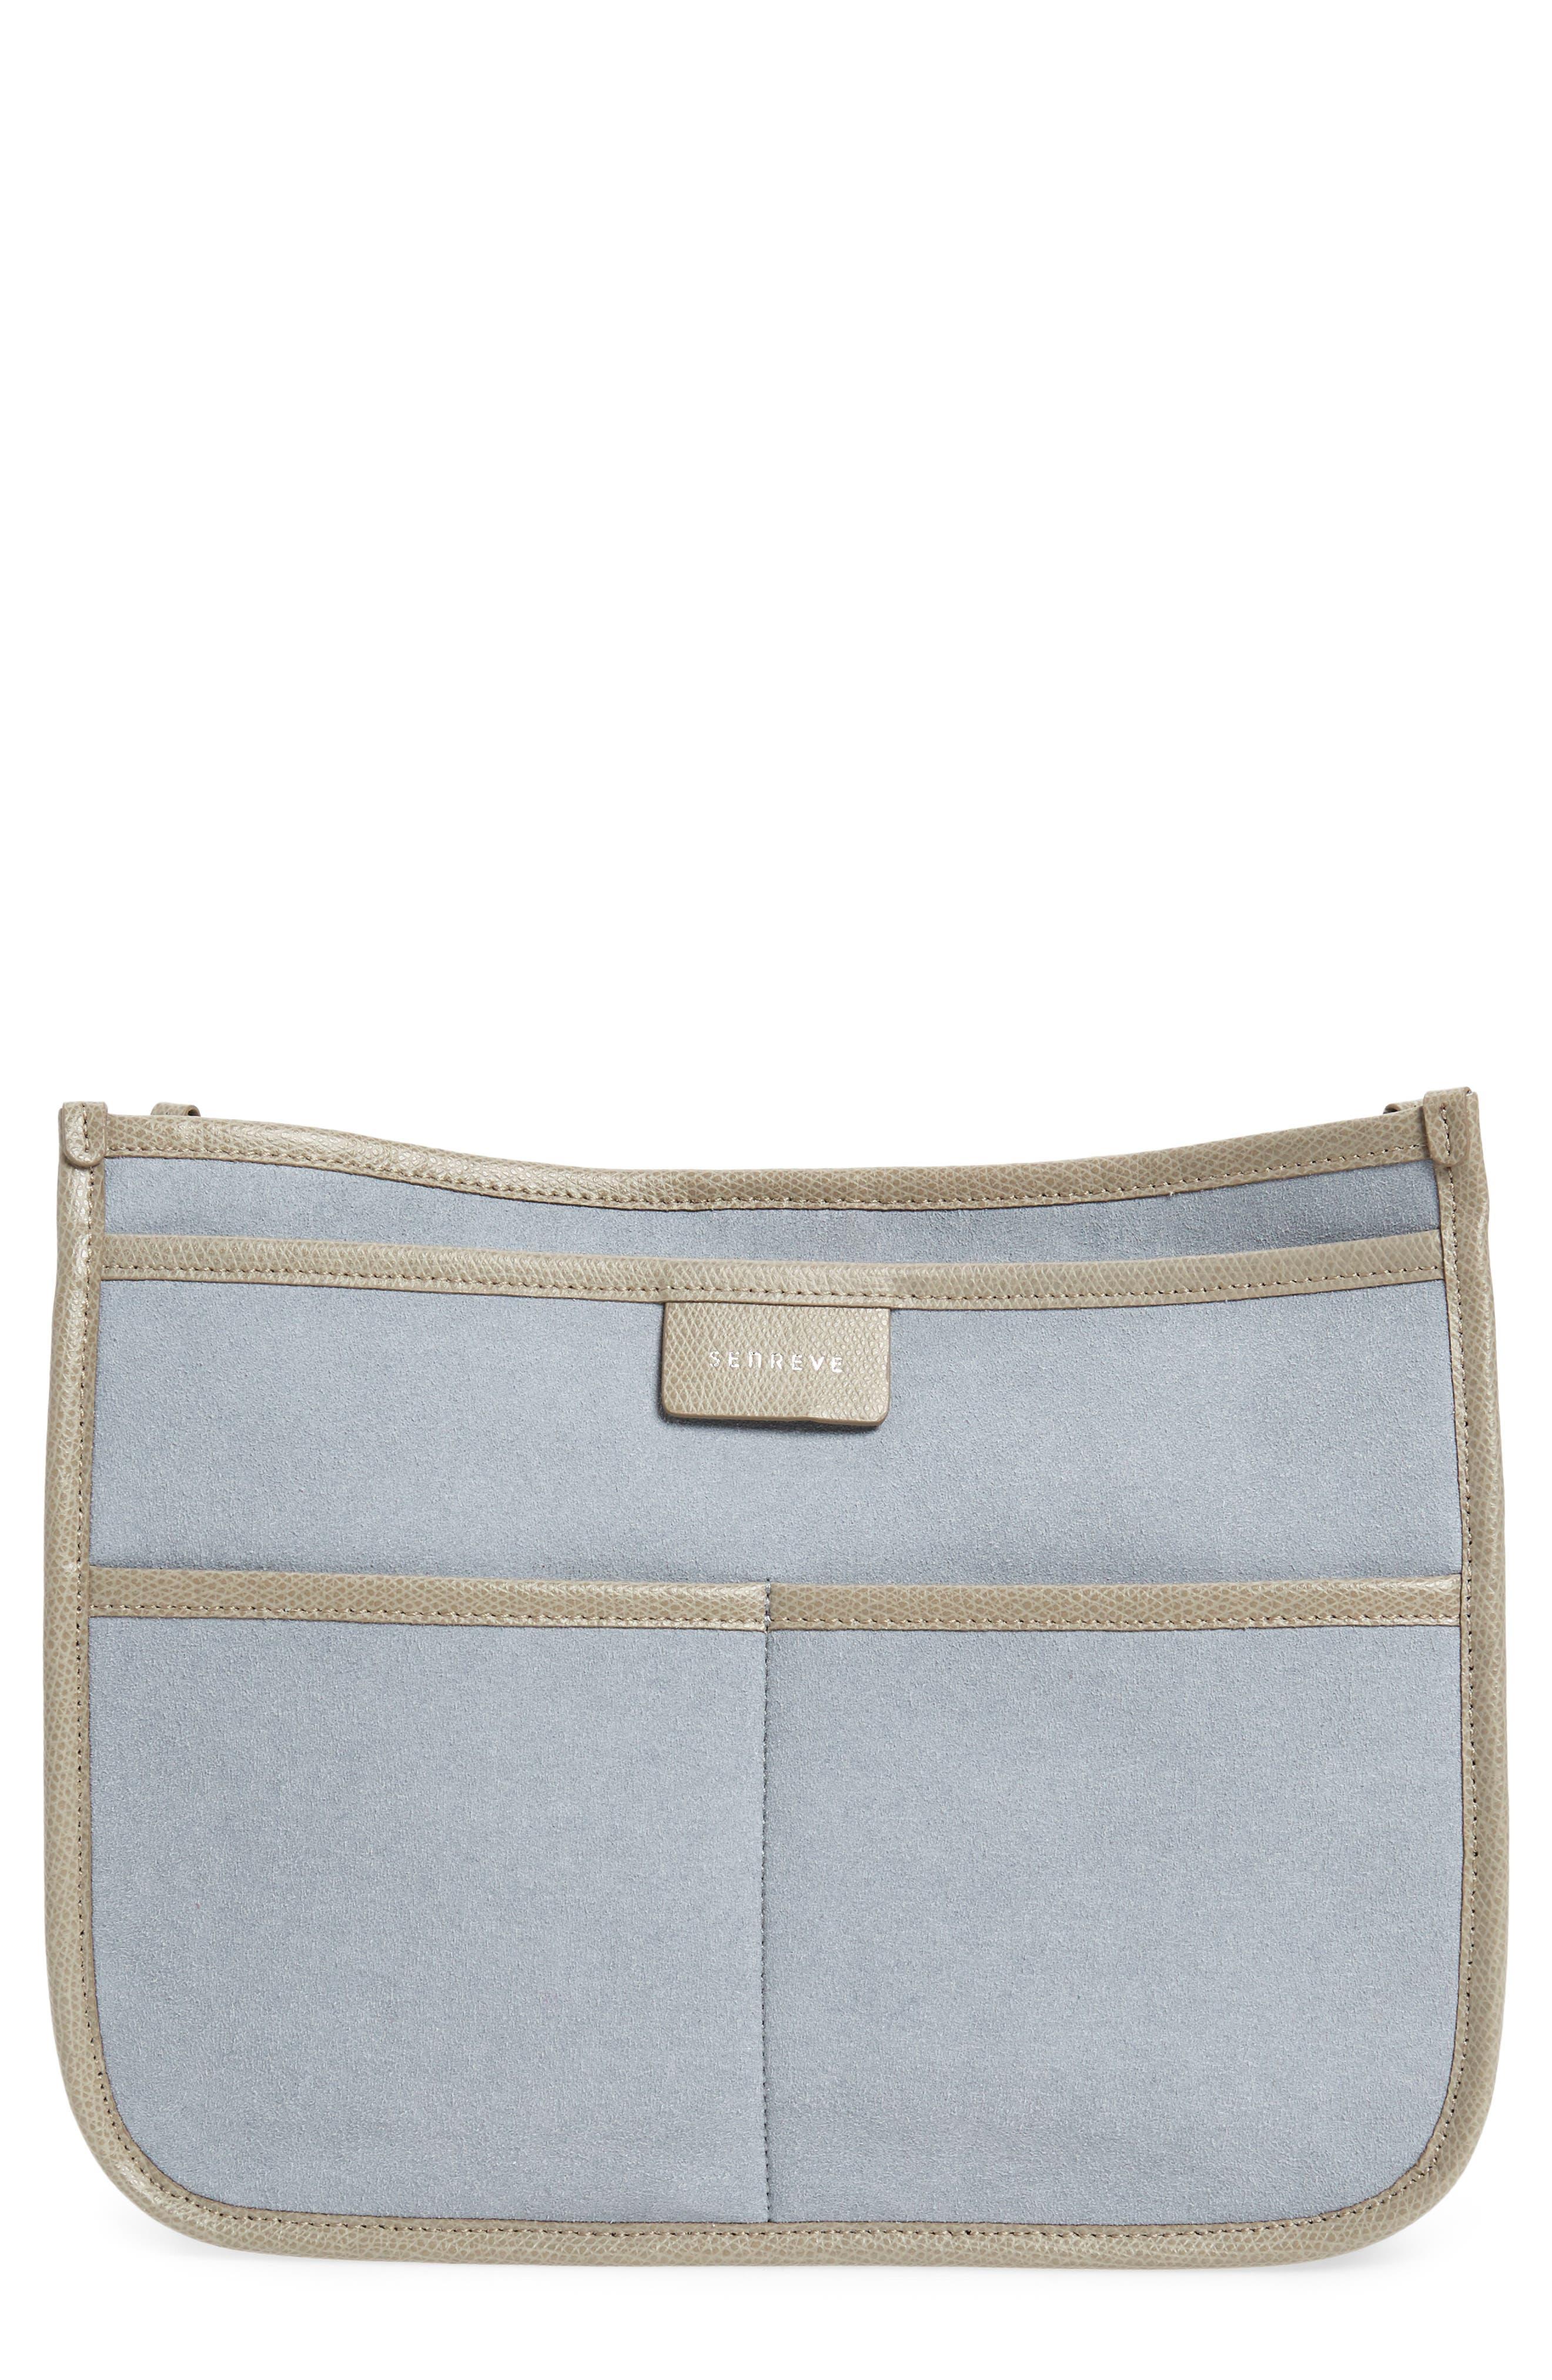 Caddy Microsuede Handbag Organizer,                             Main thumbnail 1, color,                             Sand